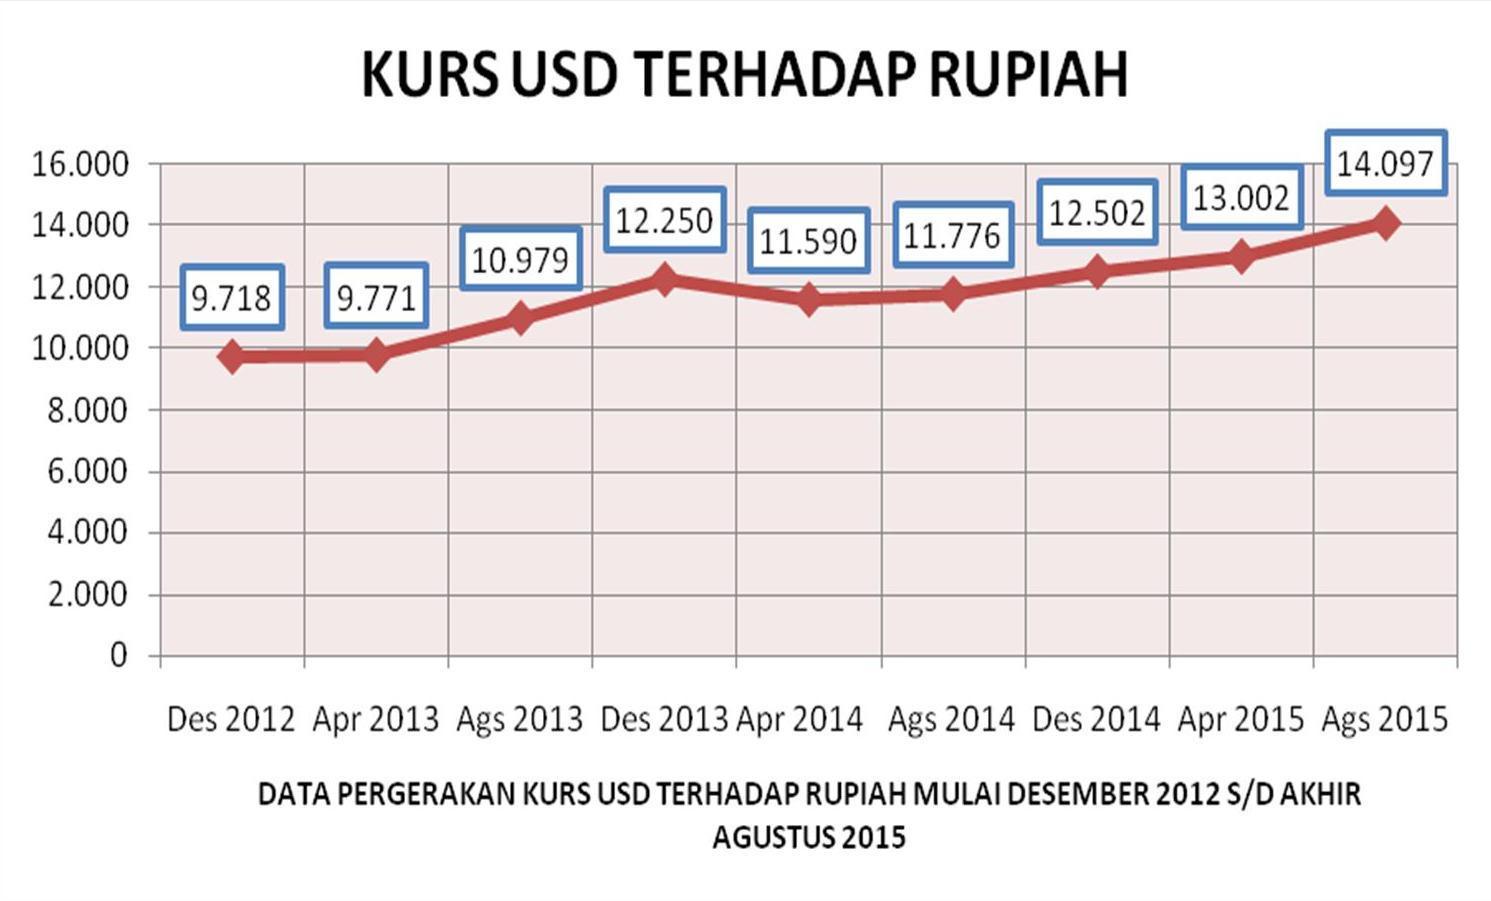 Kurs dolar timur dollar